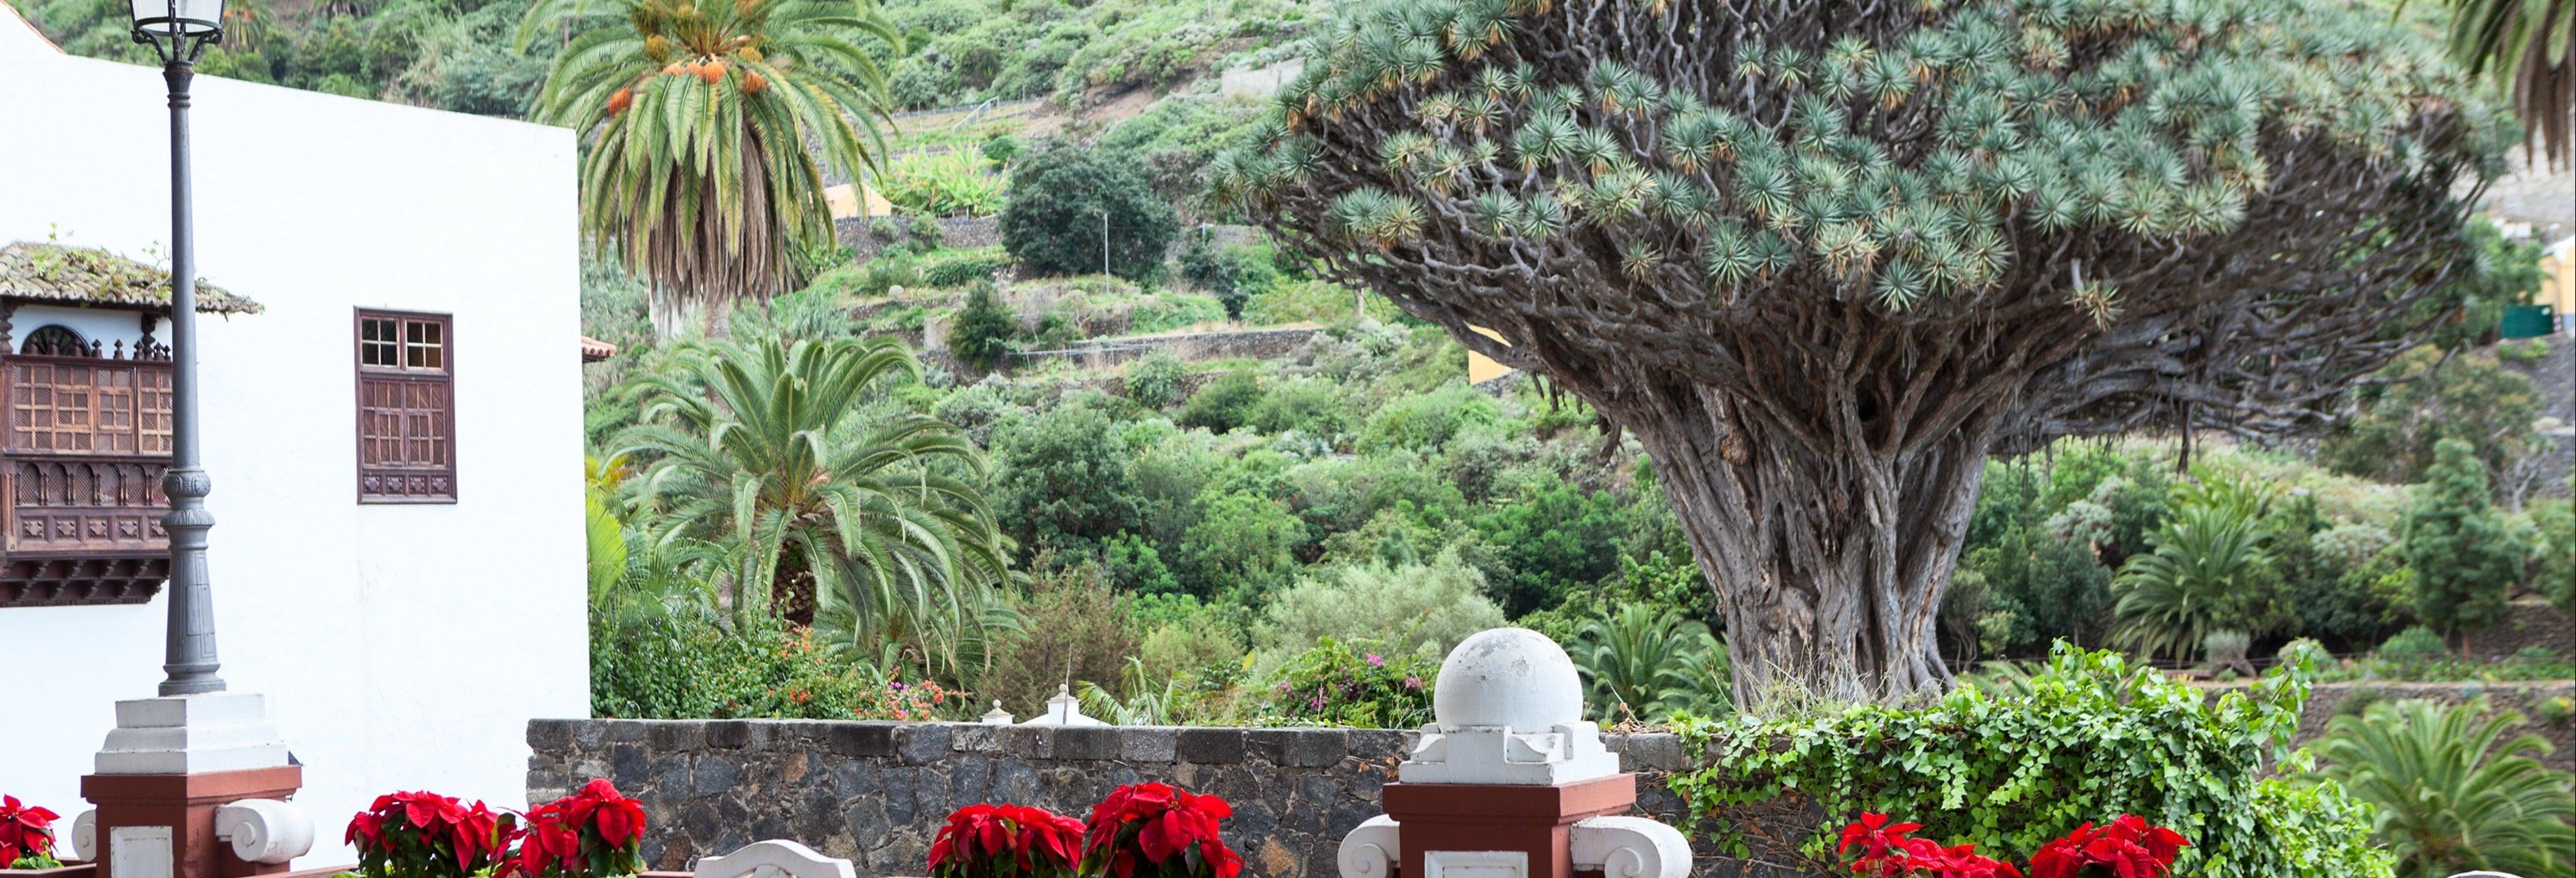 Excursión privada por Tenerife